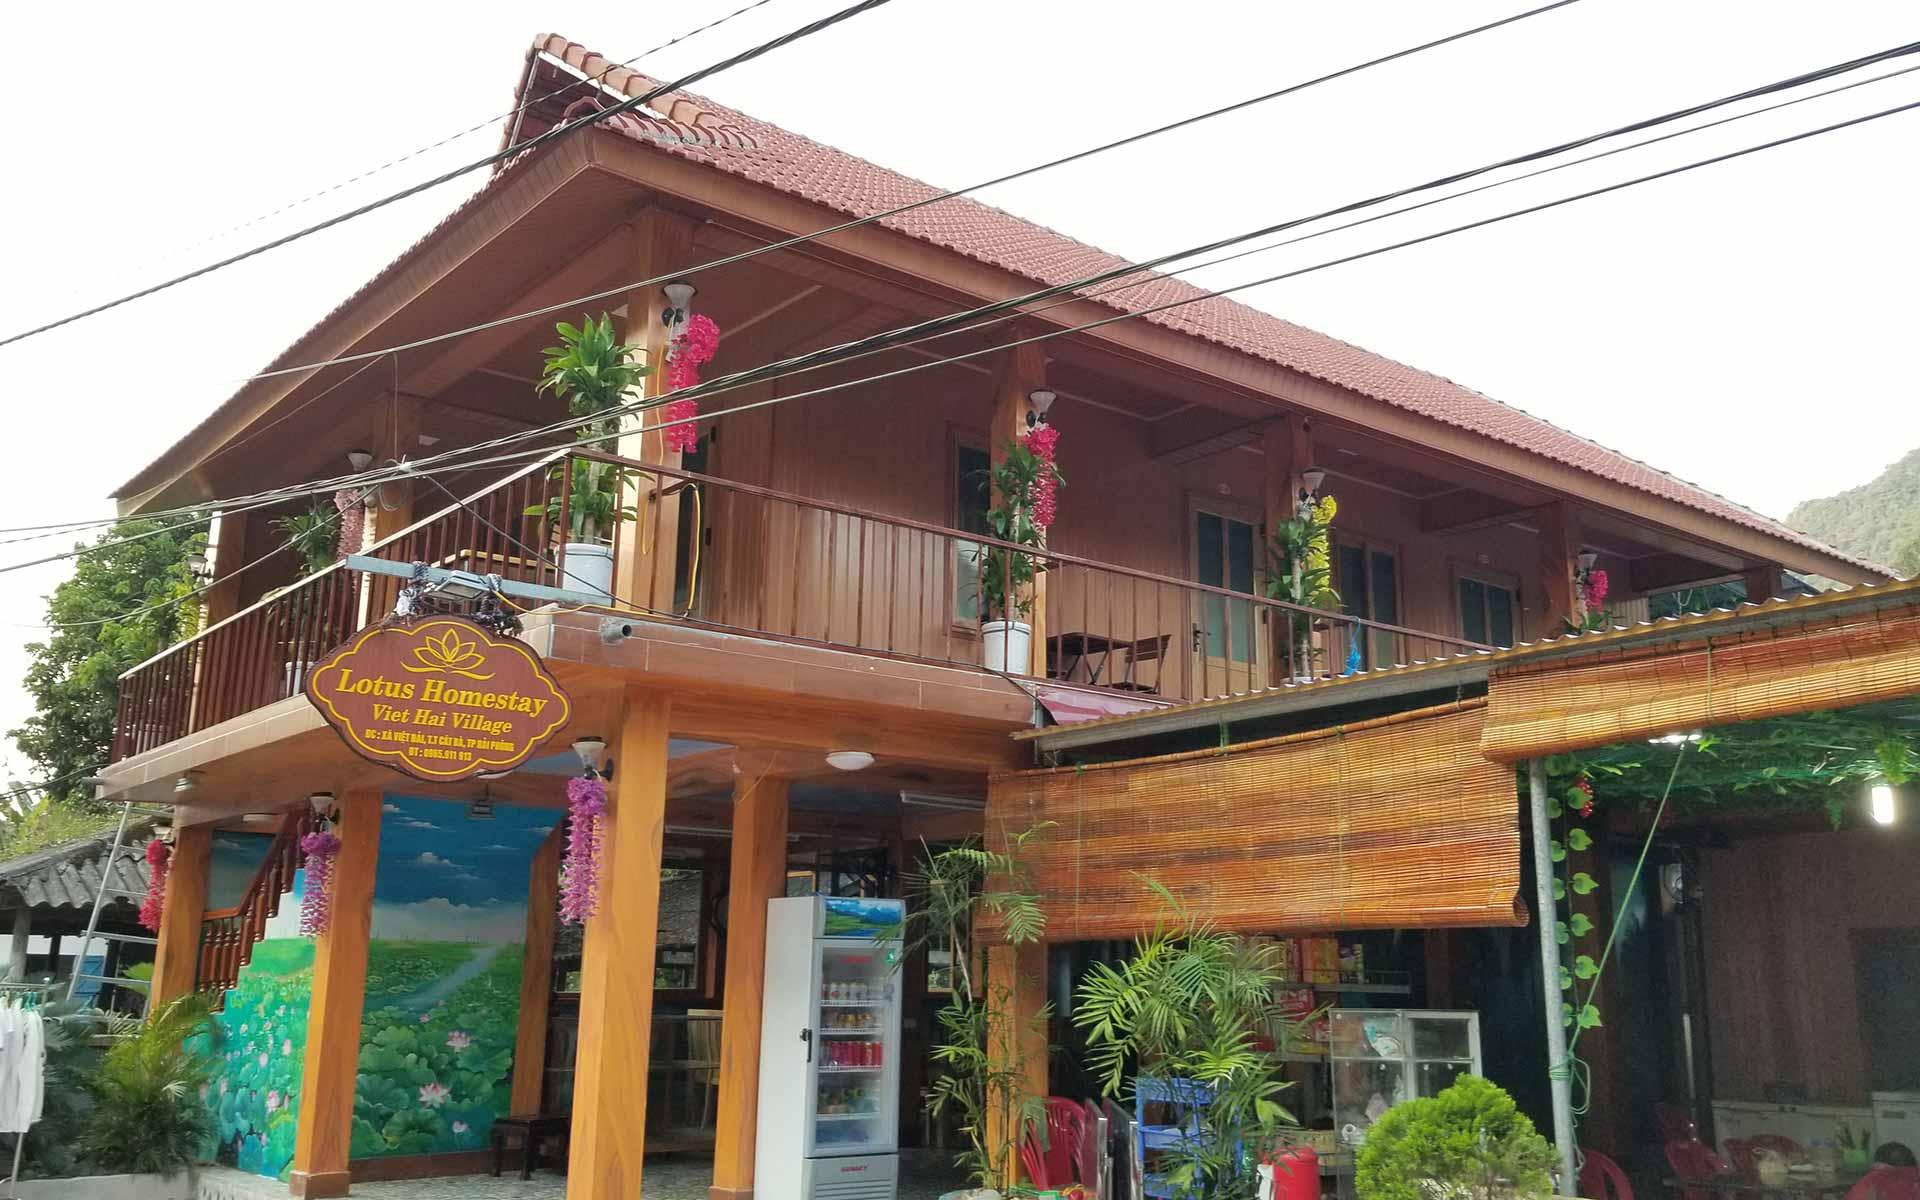 Lotus homestay at Viet Hai village